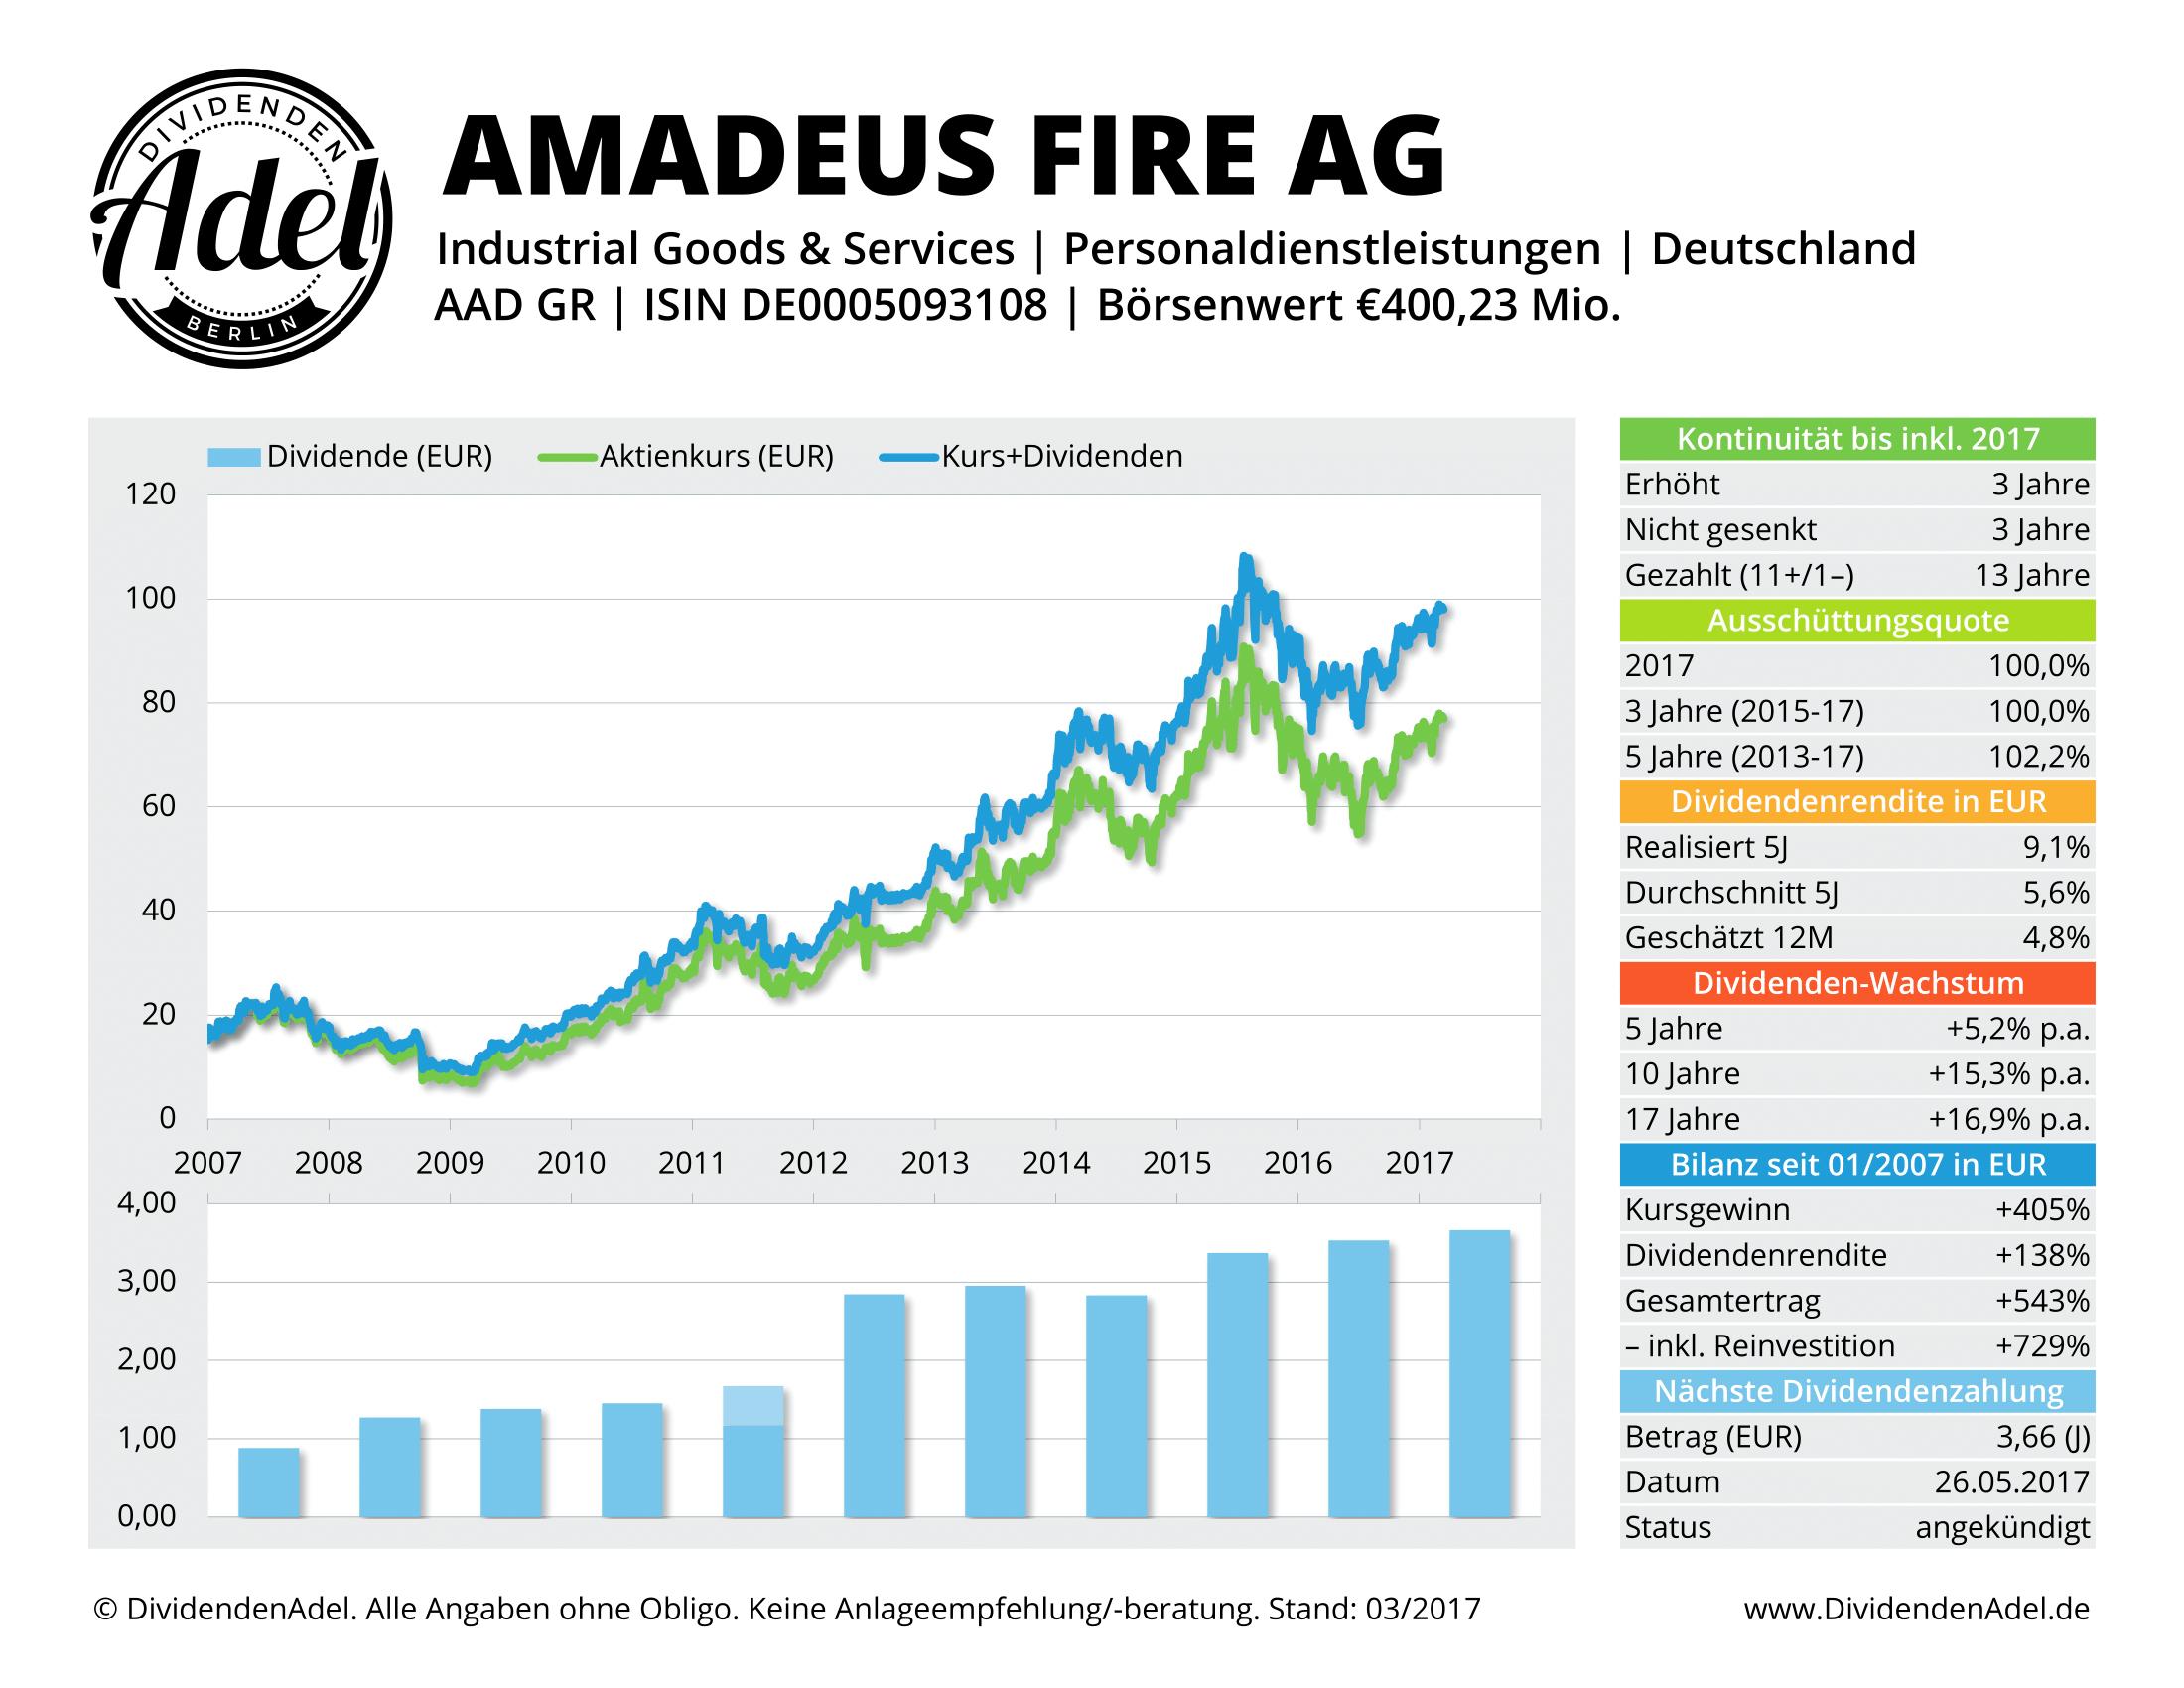 2017-03-14 AMADEUS FIRE AG DividendenAdel-Profil ab 2007-1